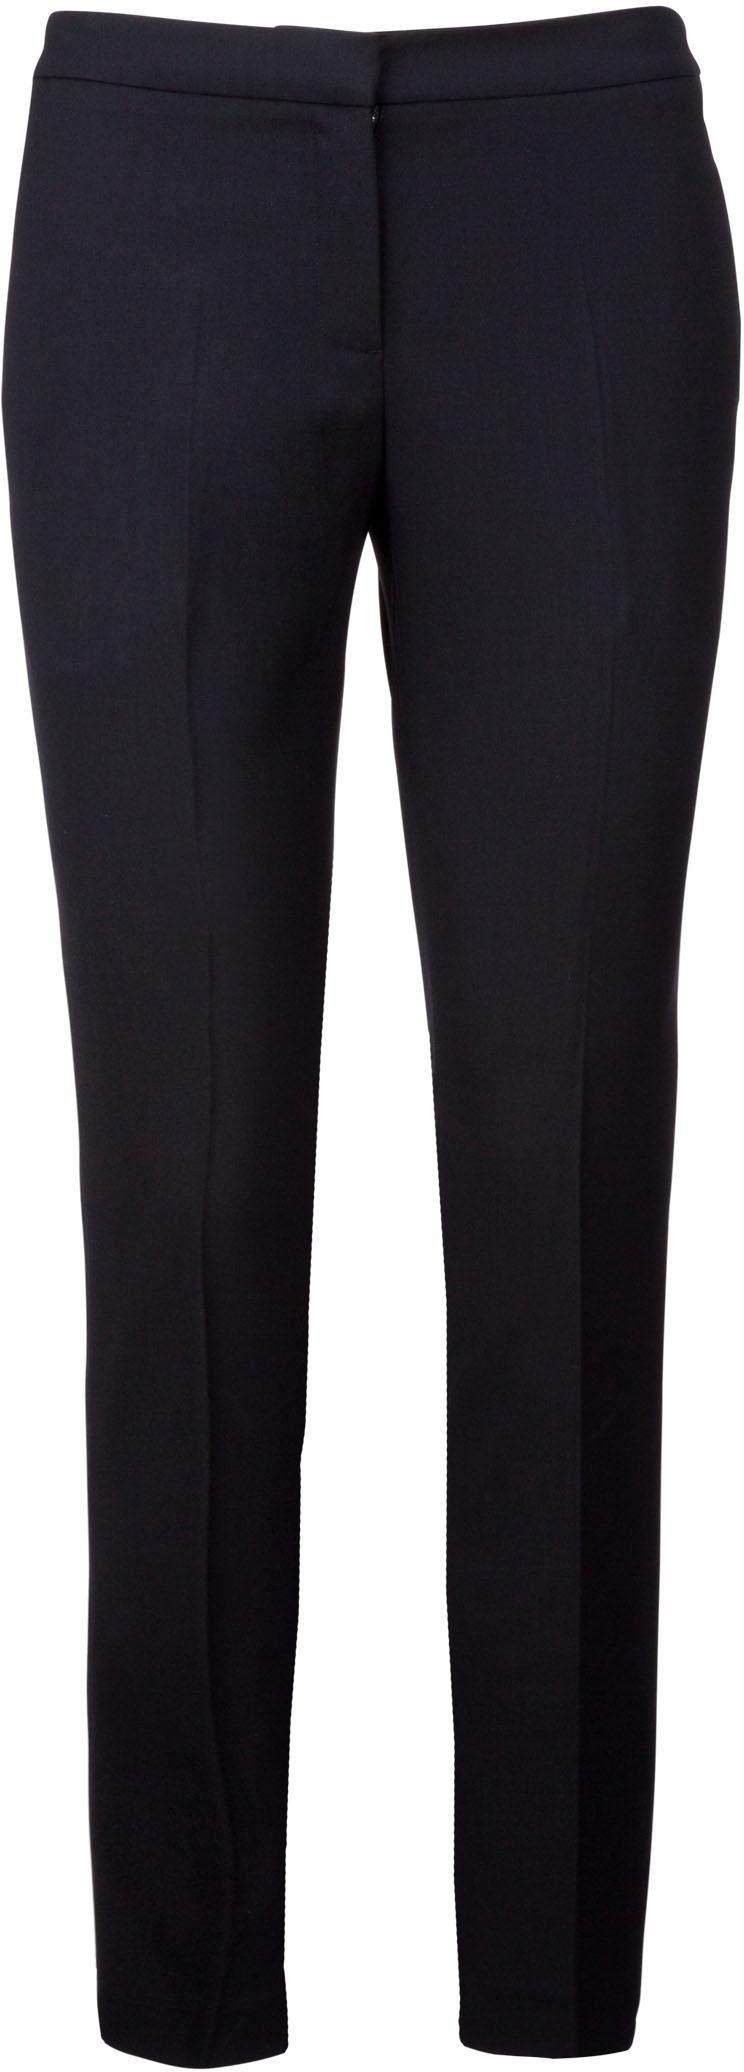 Pantalon femme - 2-1493-5